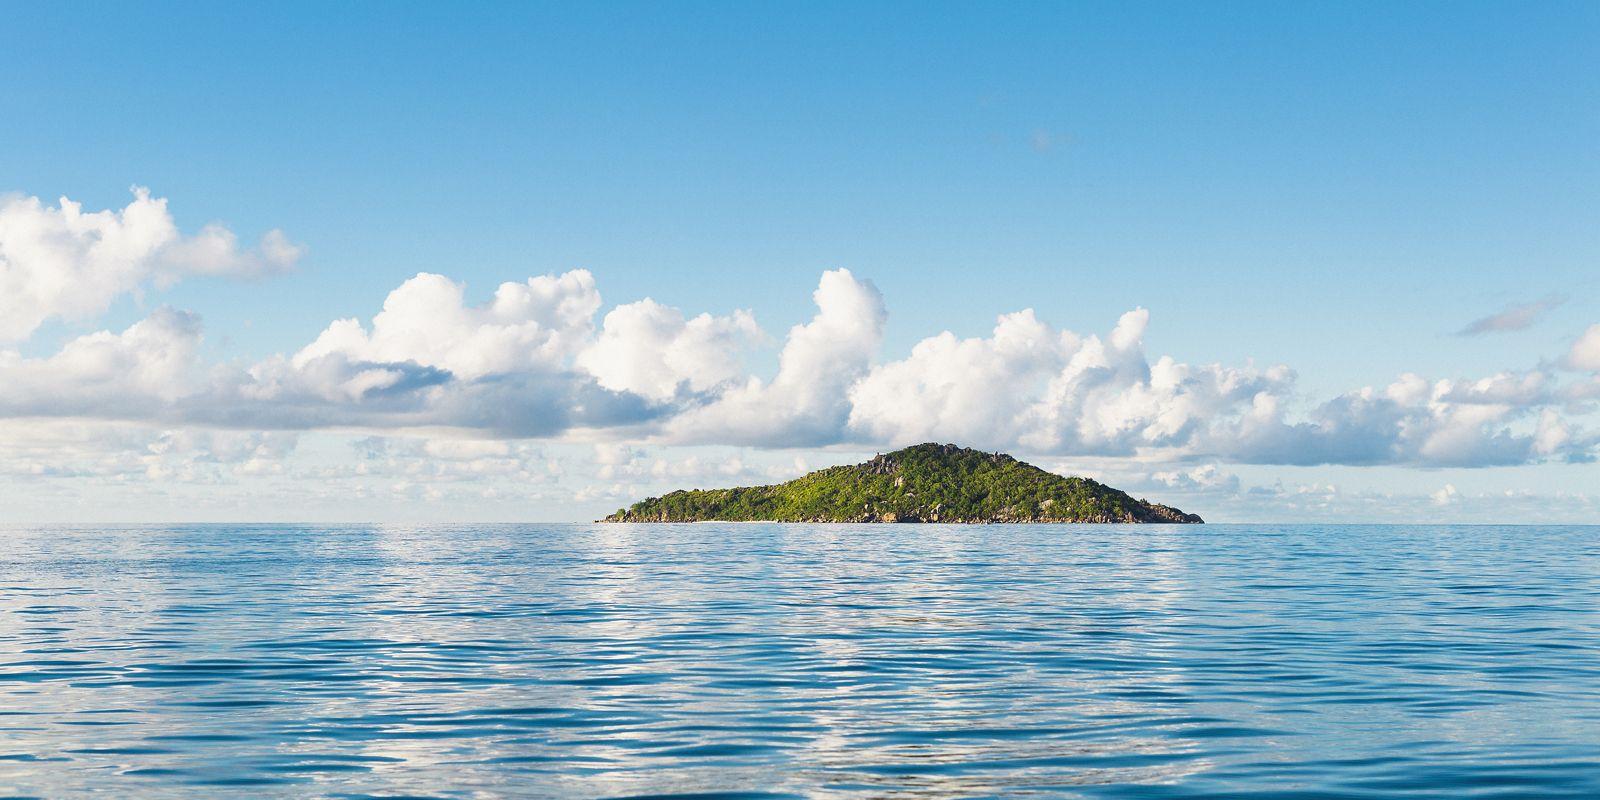 Scenic view of seascape against blue sky, Island of Petite Soeur, Seychelles